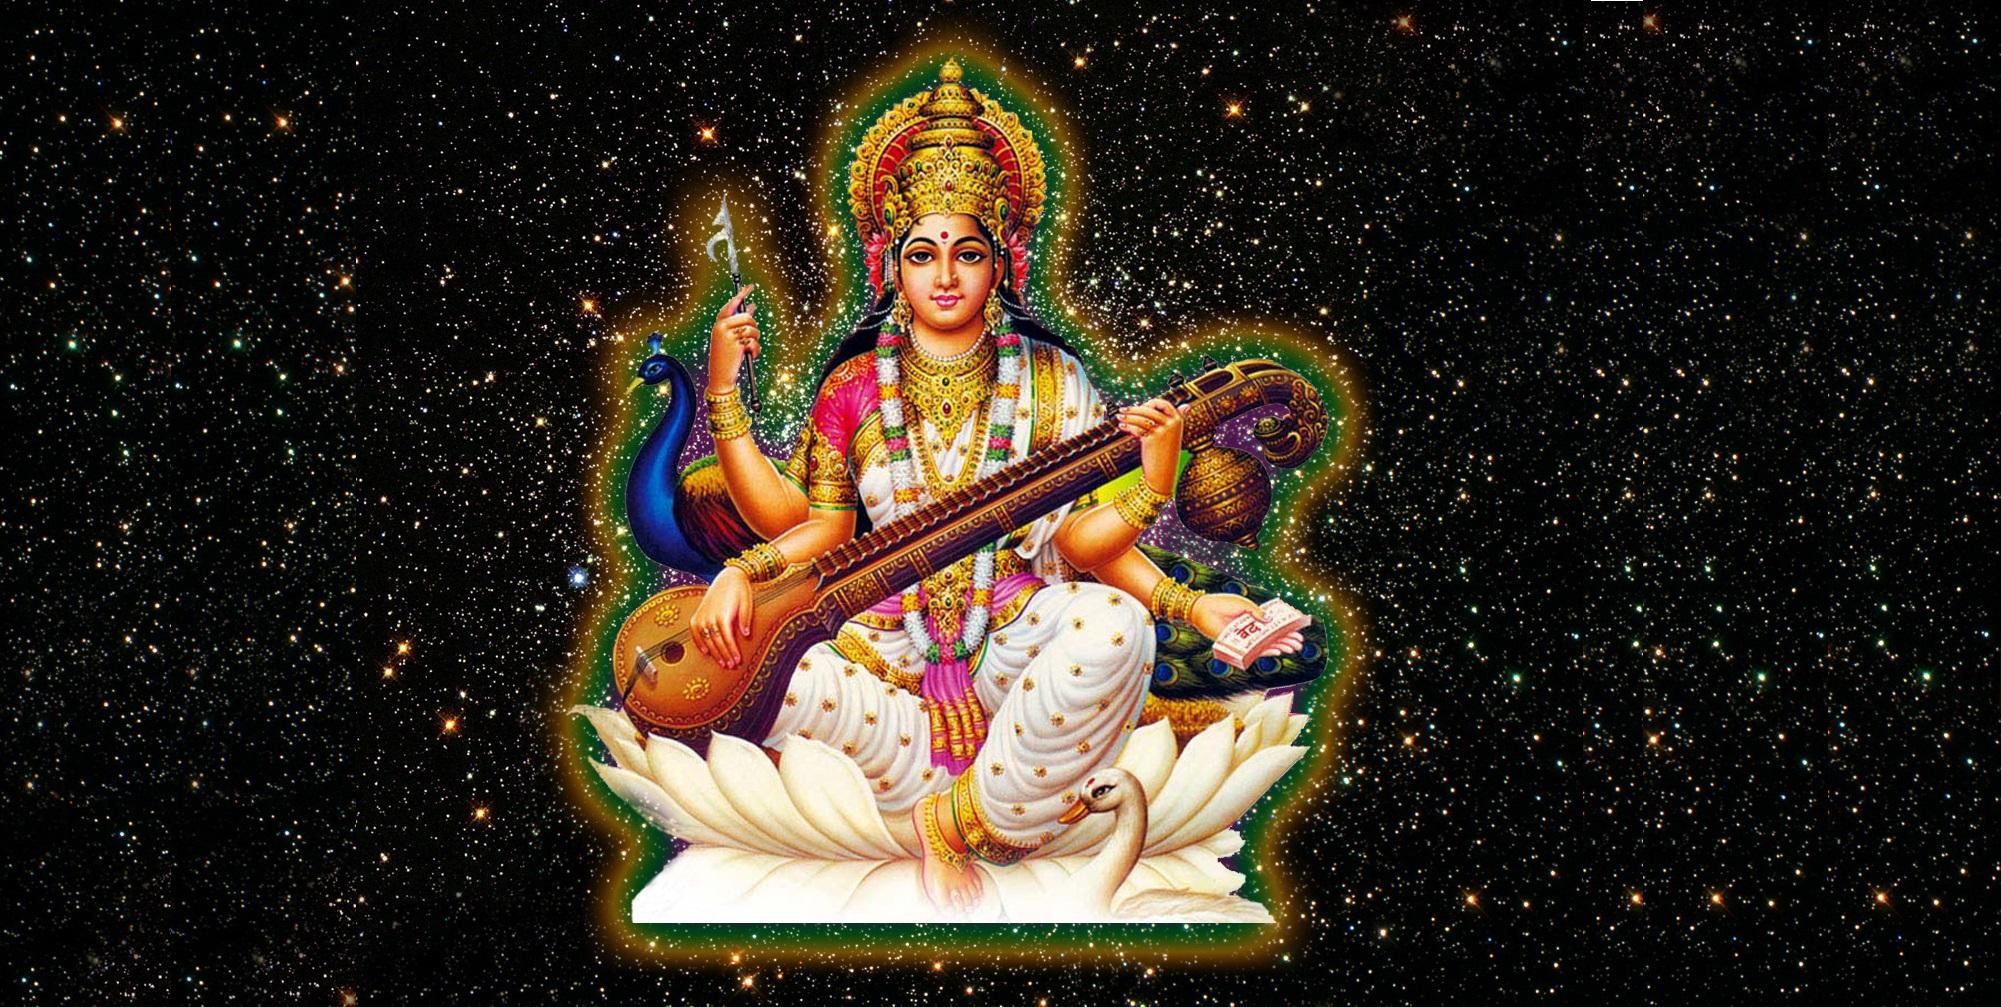 Happy Teej Hd Wallpapers 108 Names Of Saraswati Maa सरस्वती मा के १०८ नाम Wordzz